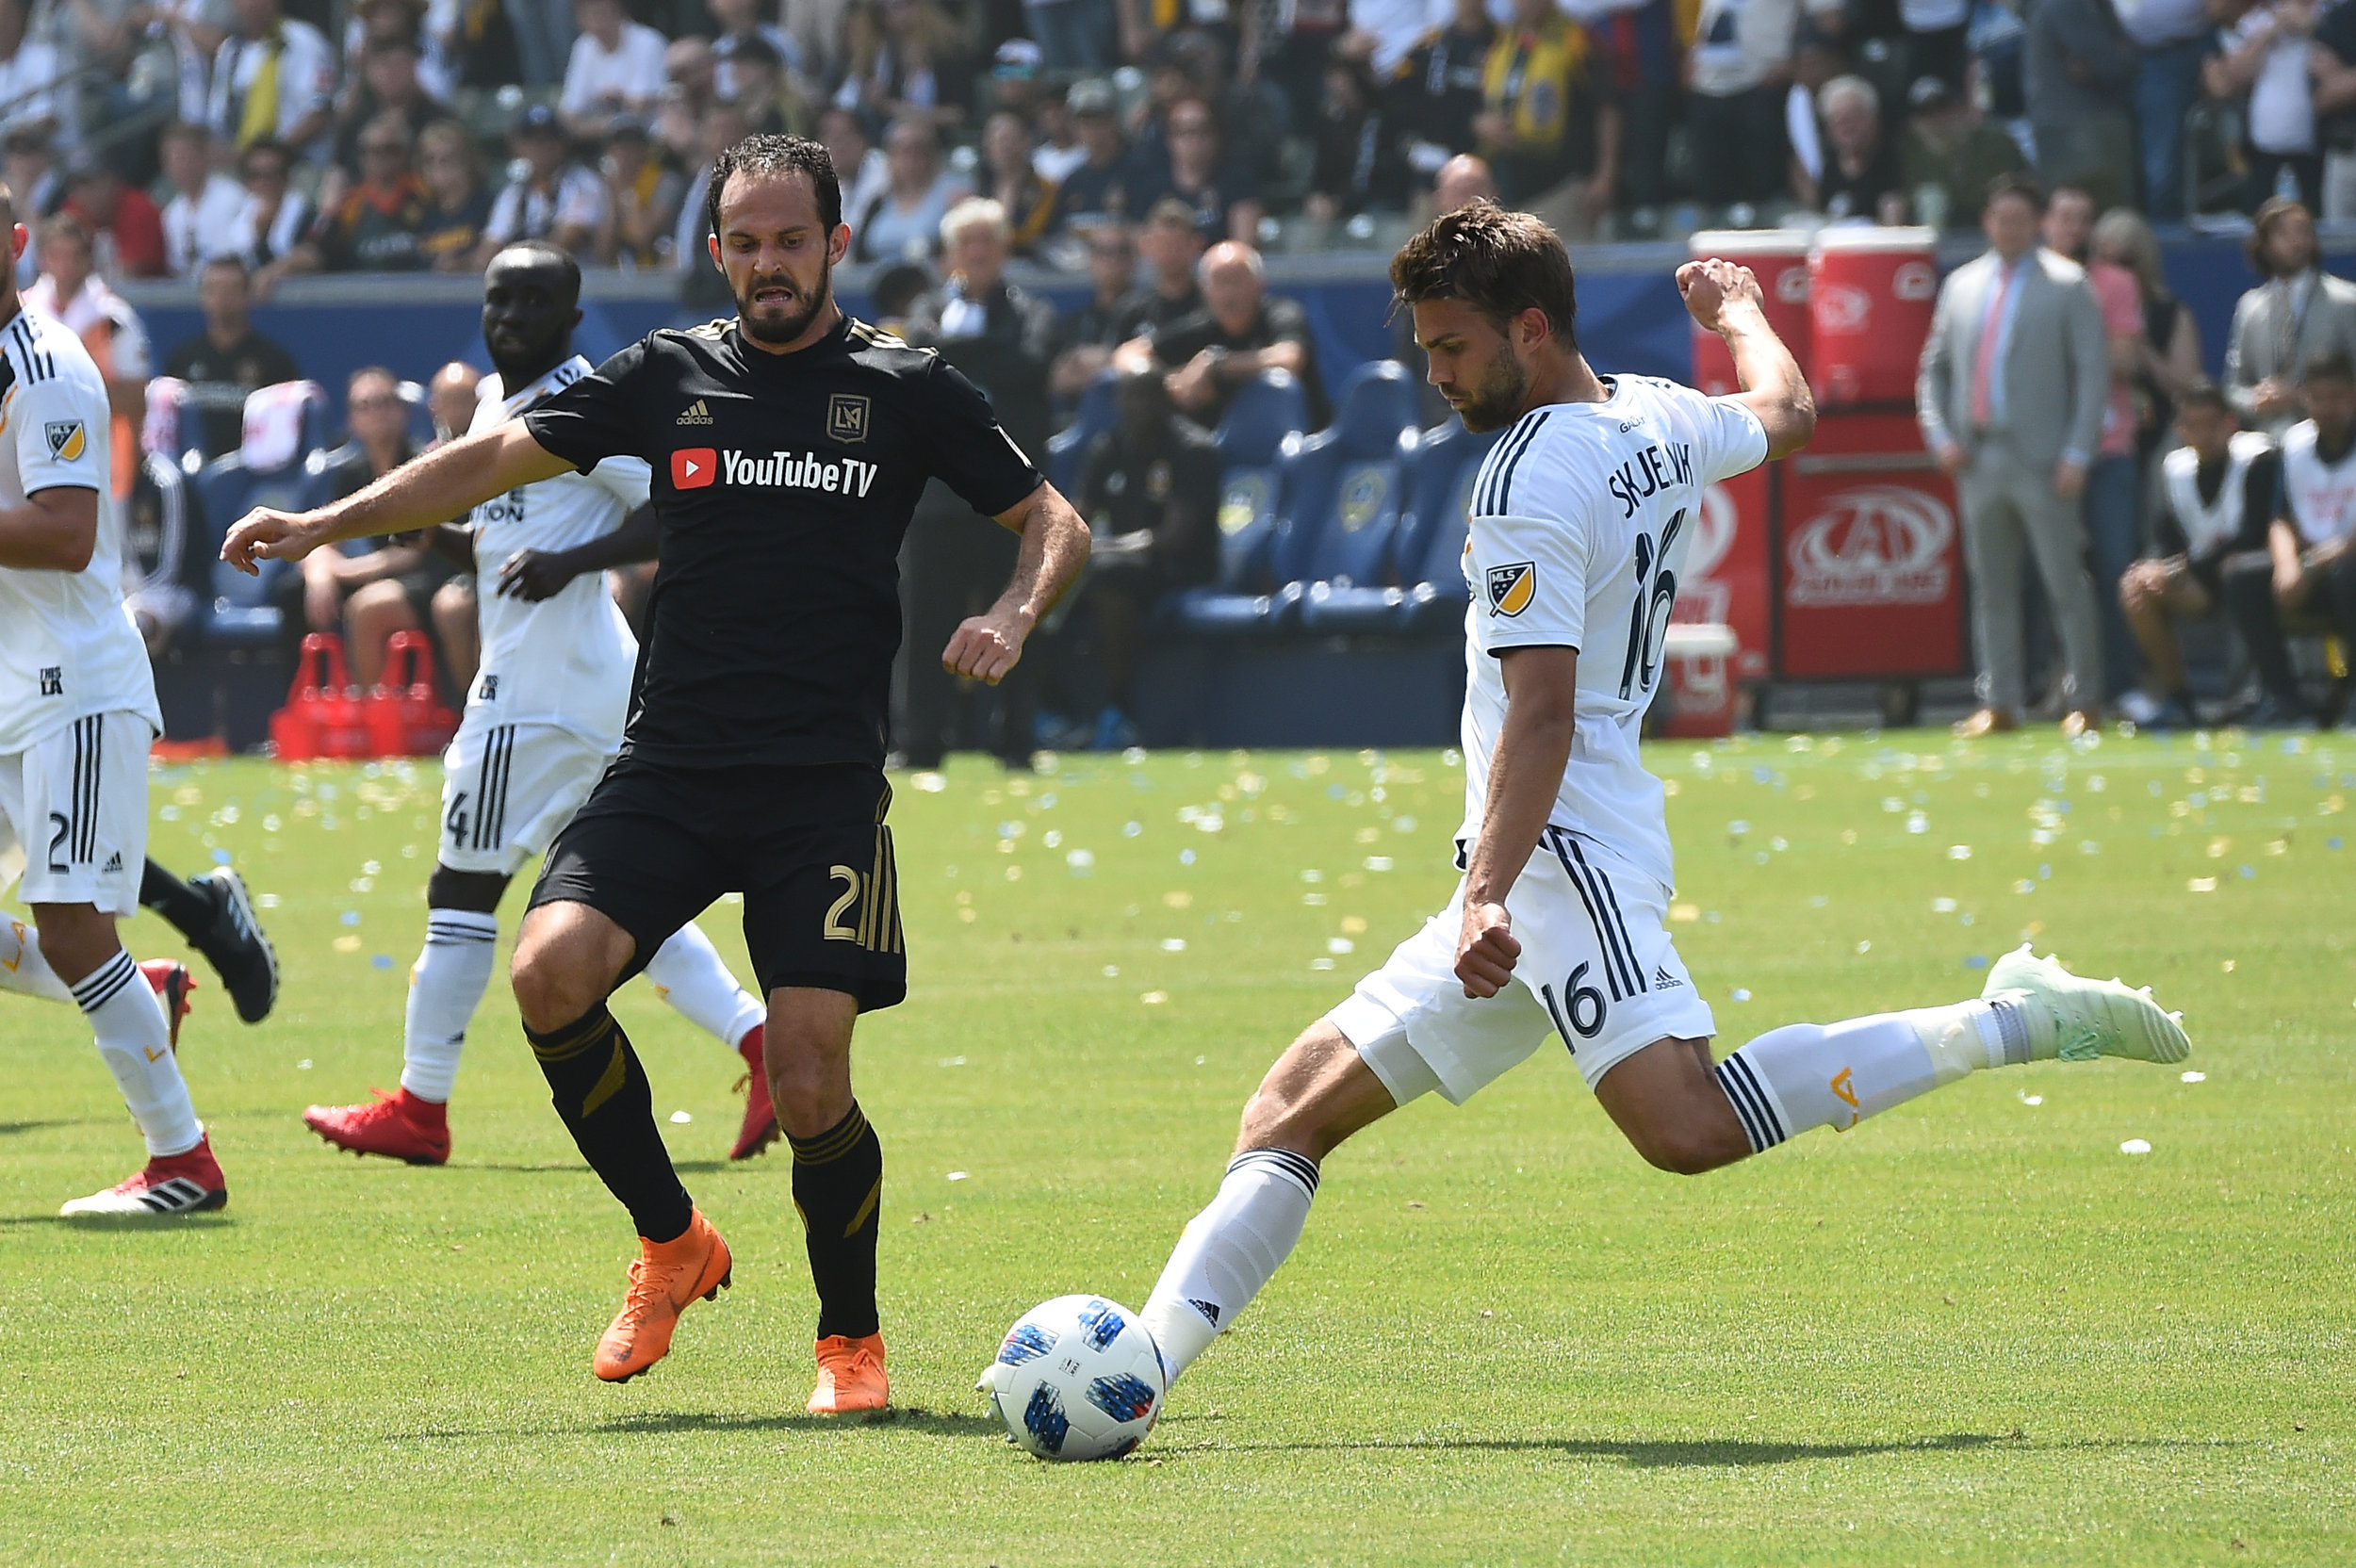 20180331_LAFC_Galaxy_Bernstein_1659.JPG